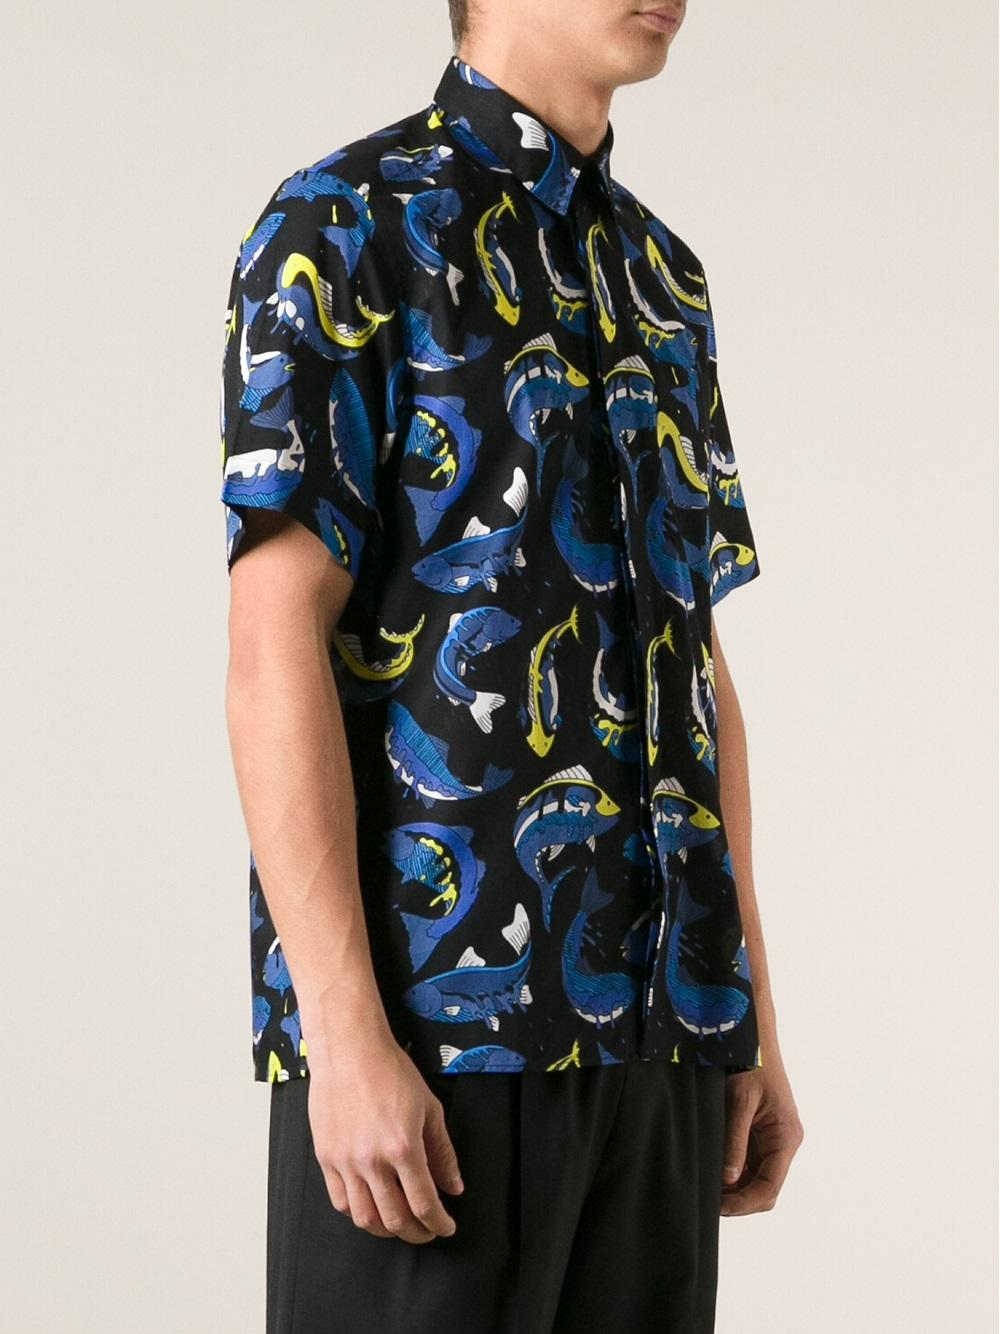 Lyst kenzo fish print shirt in black for men for Fish print shirt